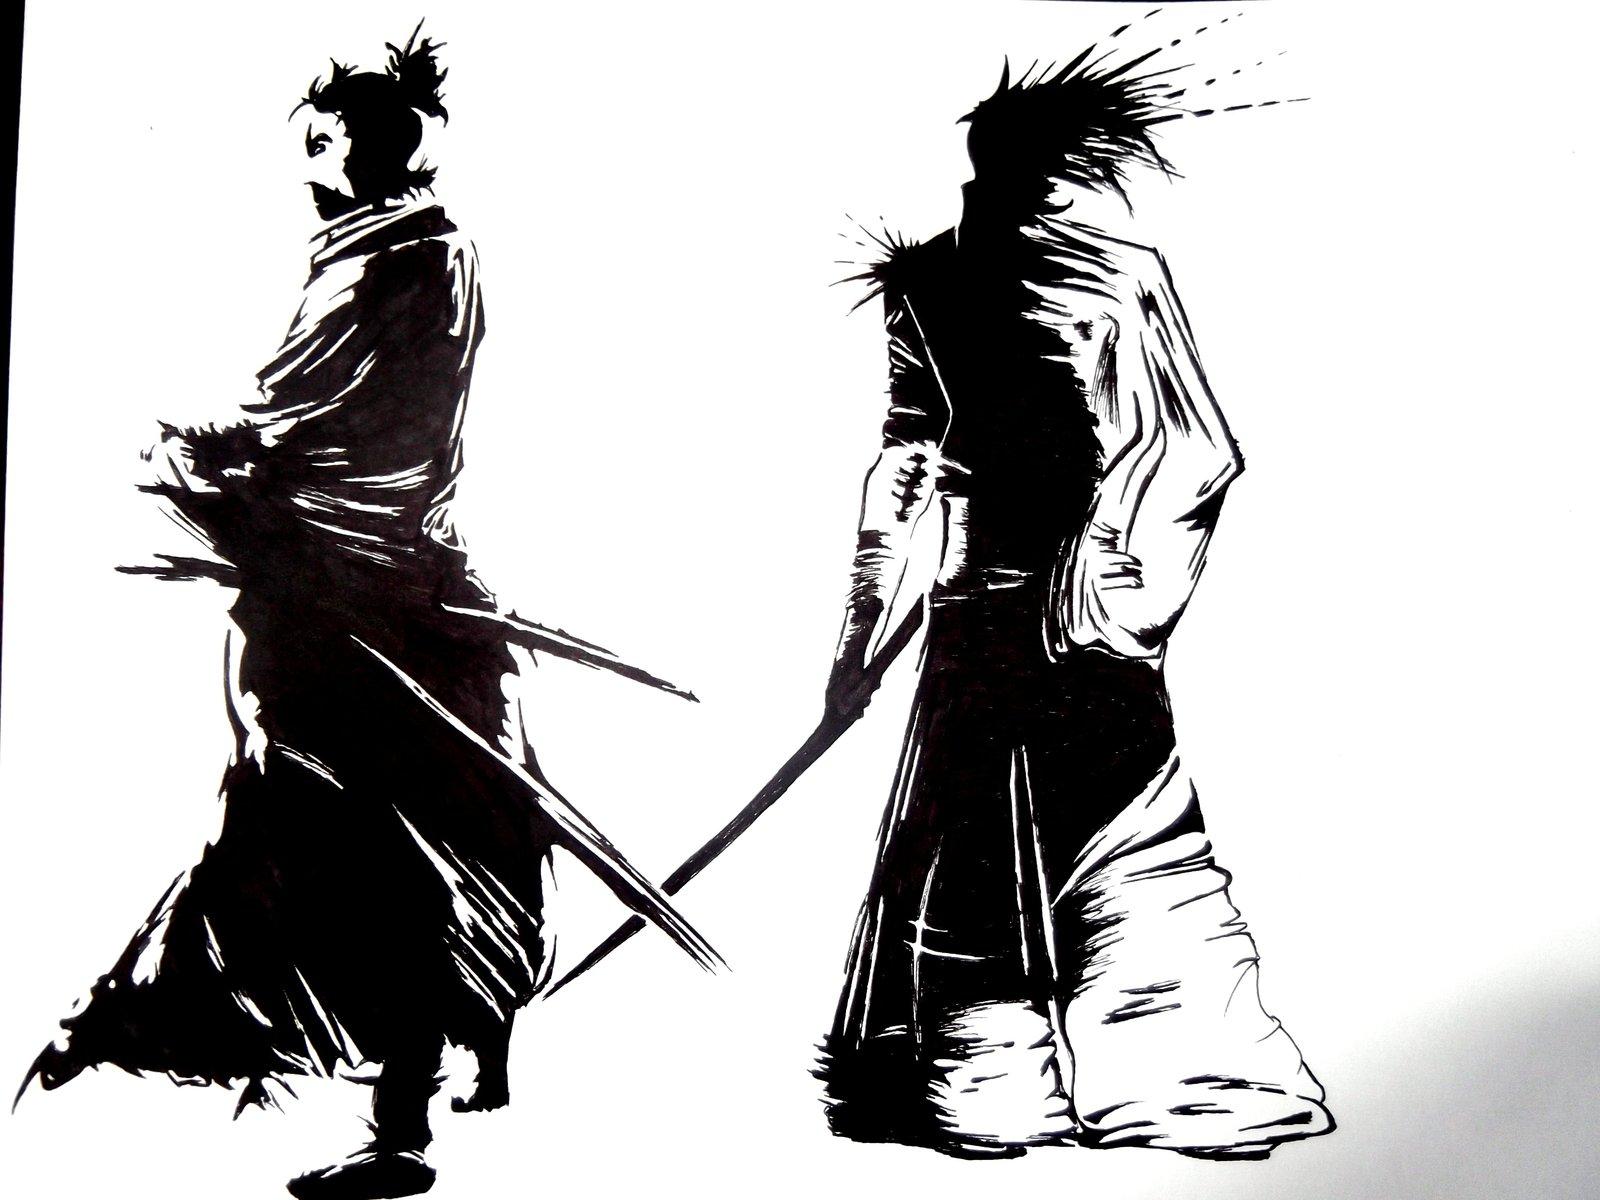 Drawn samurai bushido Colubusu colubusu by DeviantArt drawing